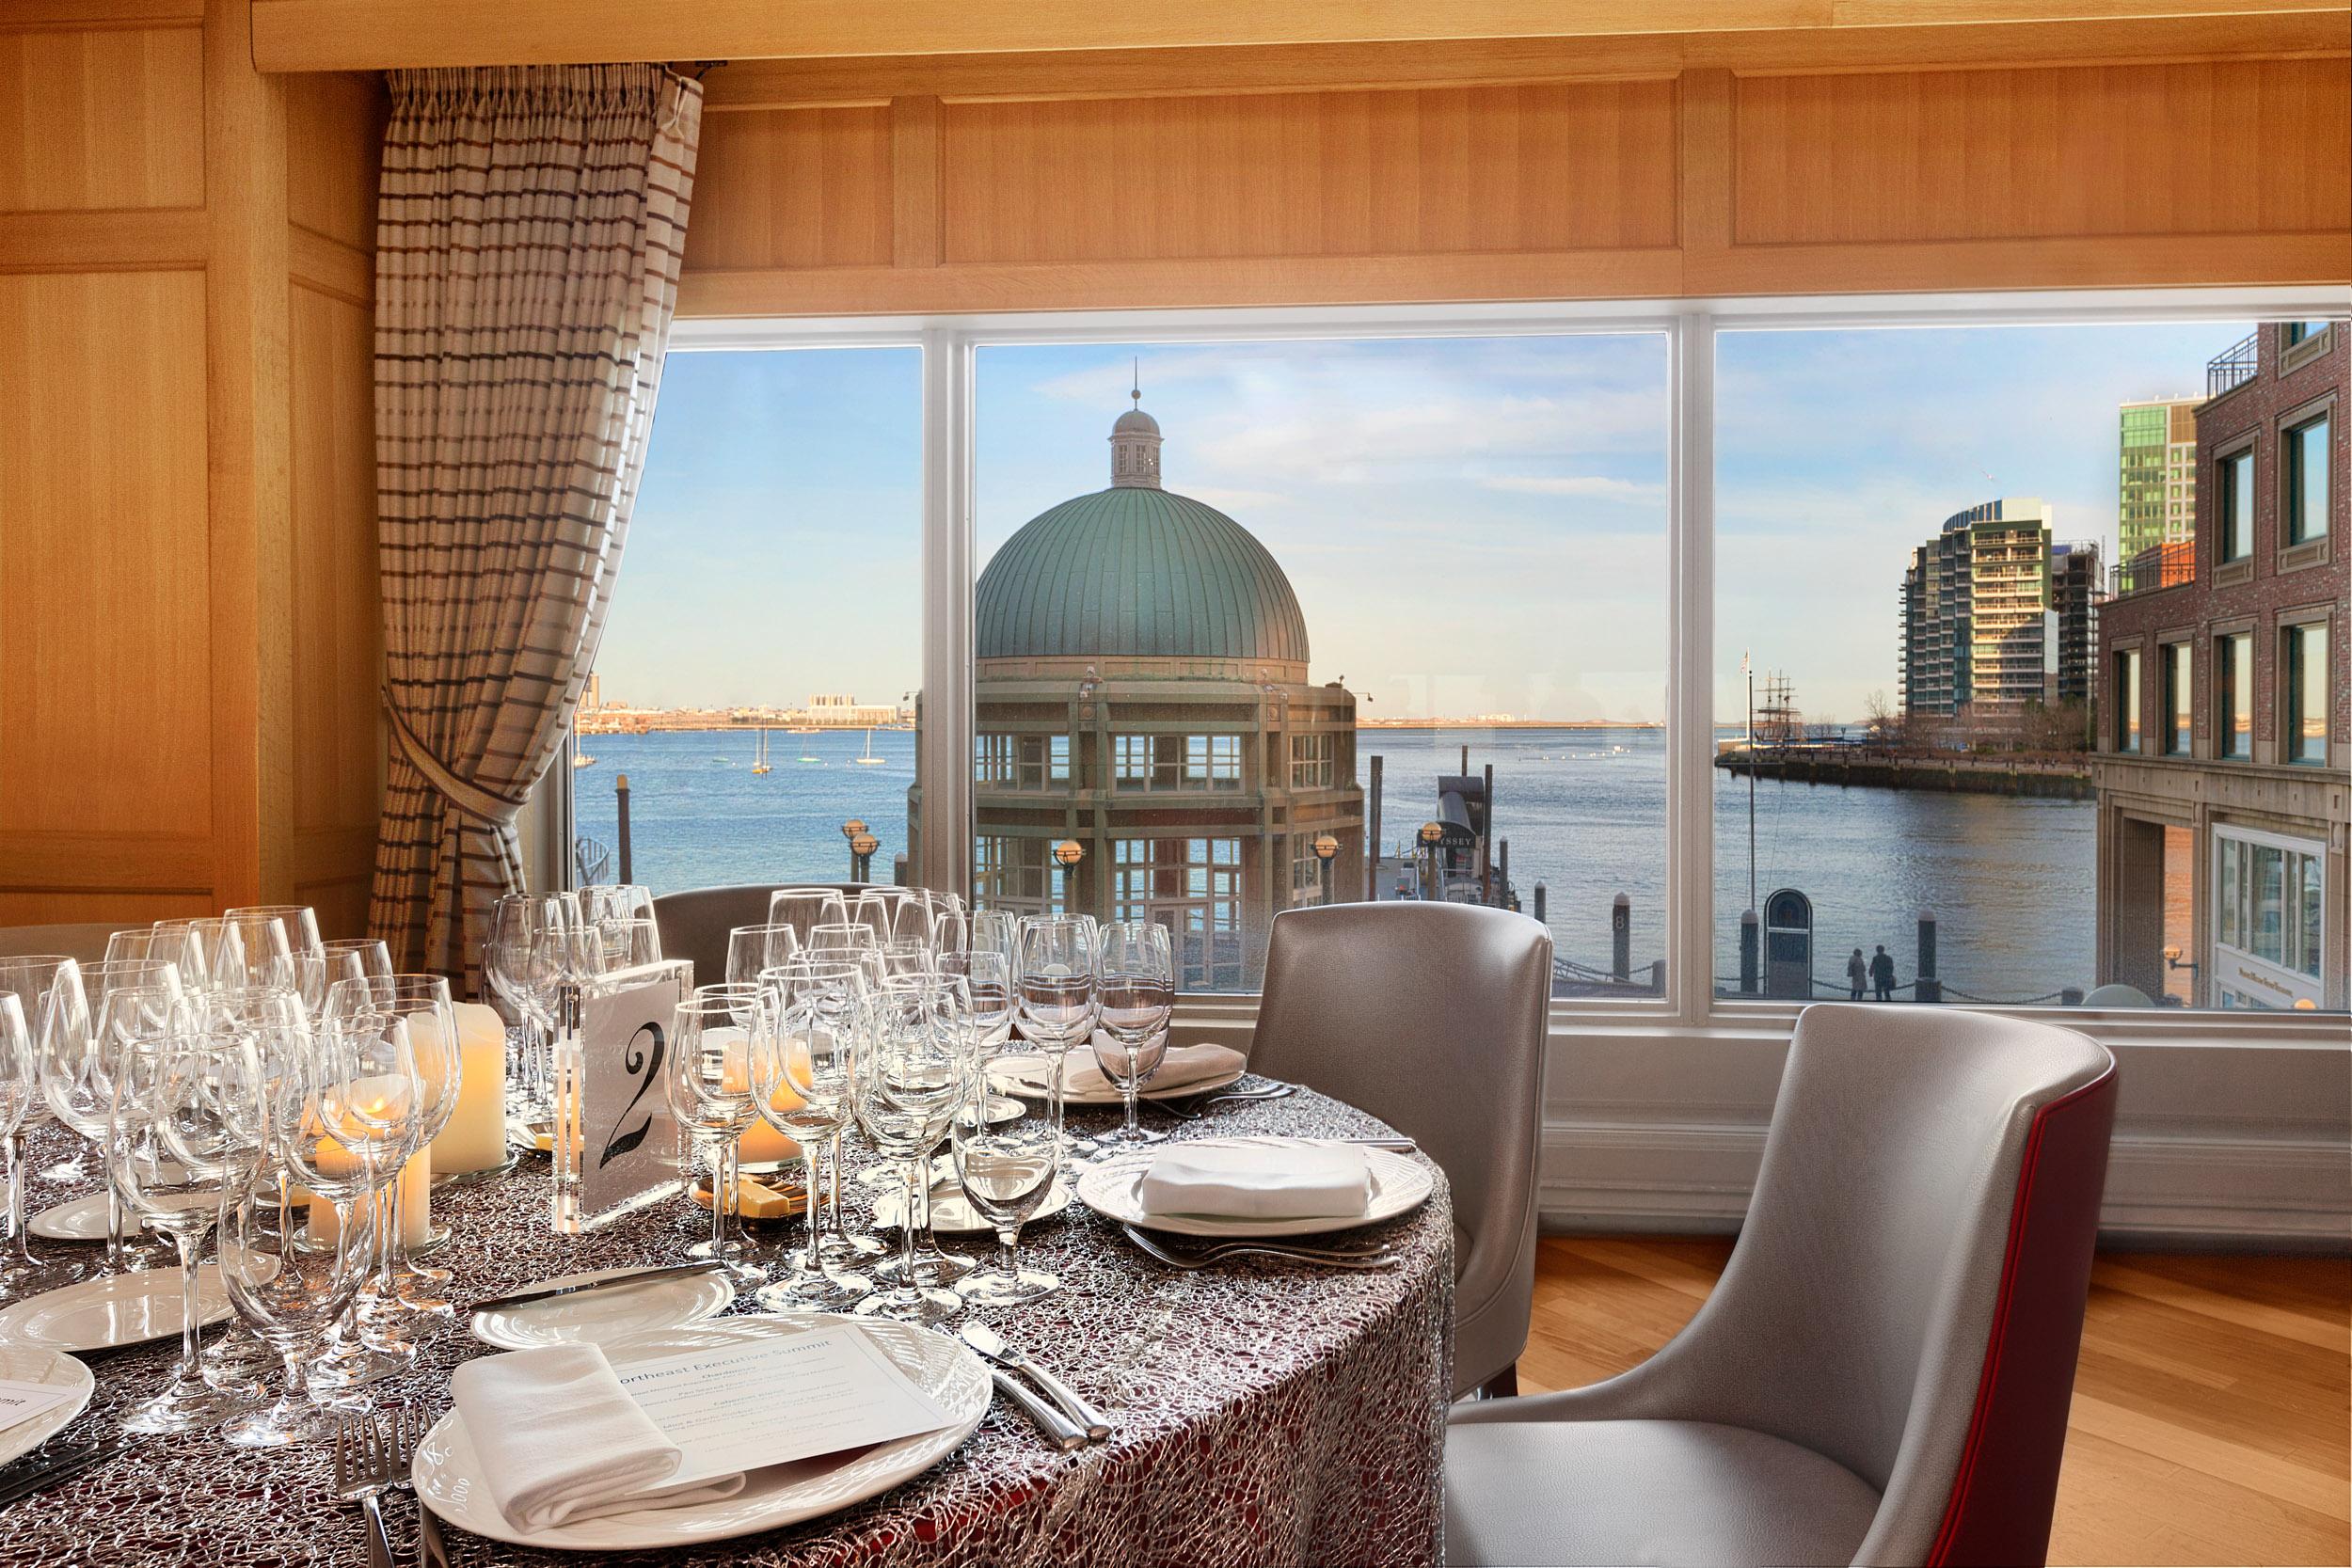 Boston Harbor Hotel Meritage